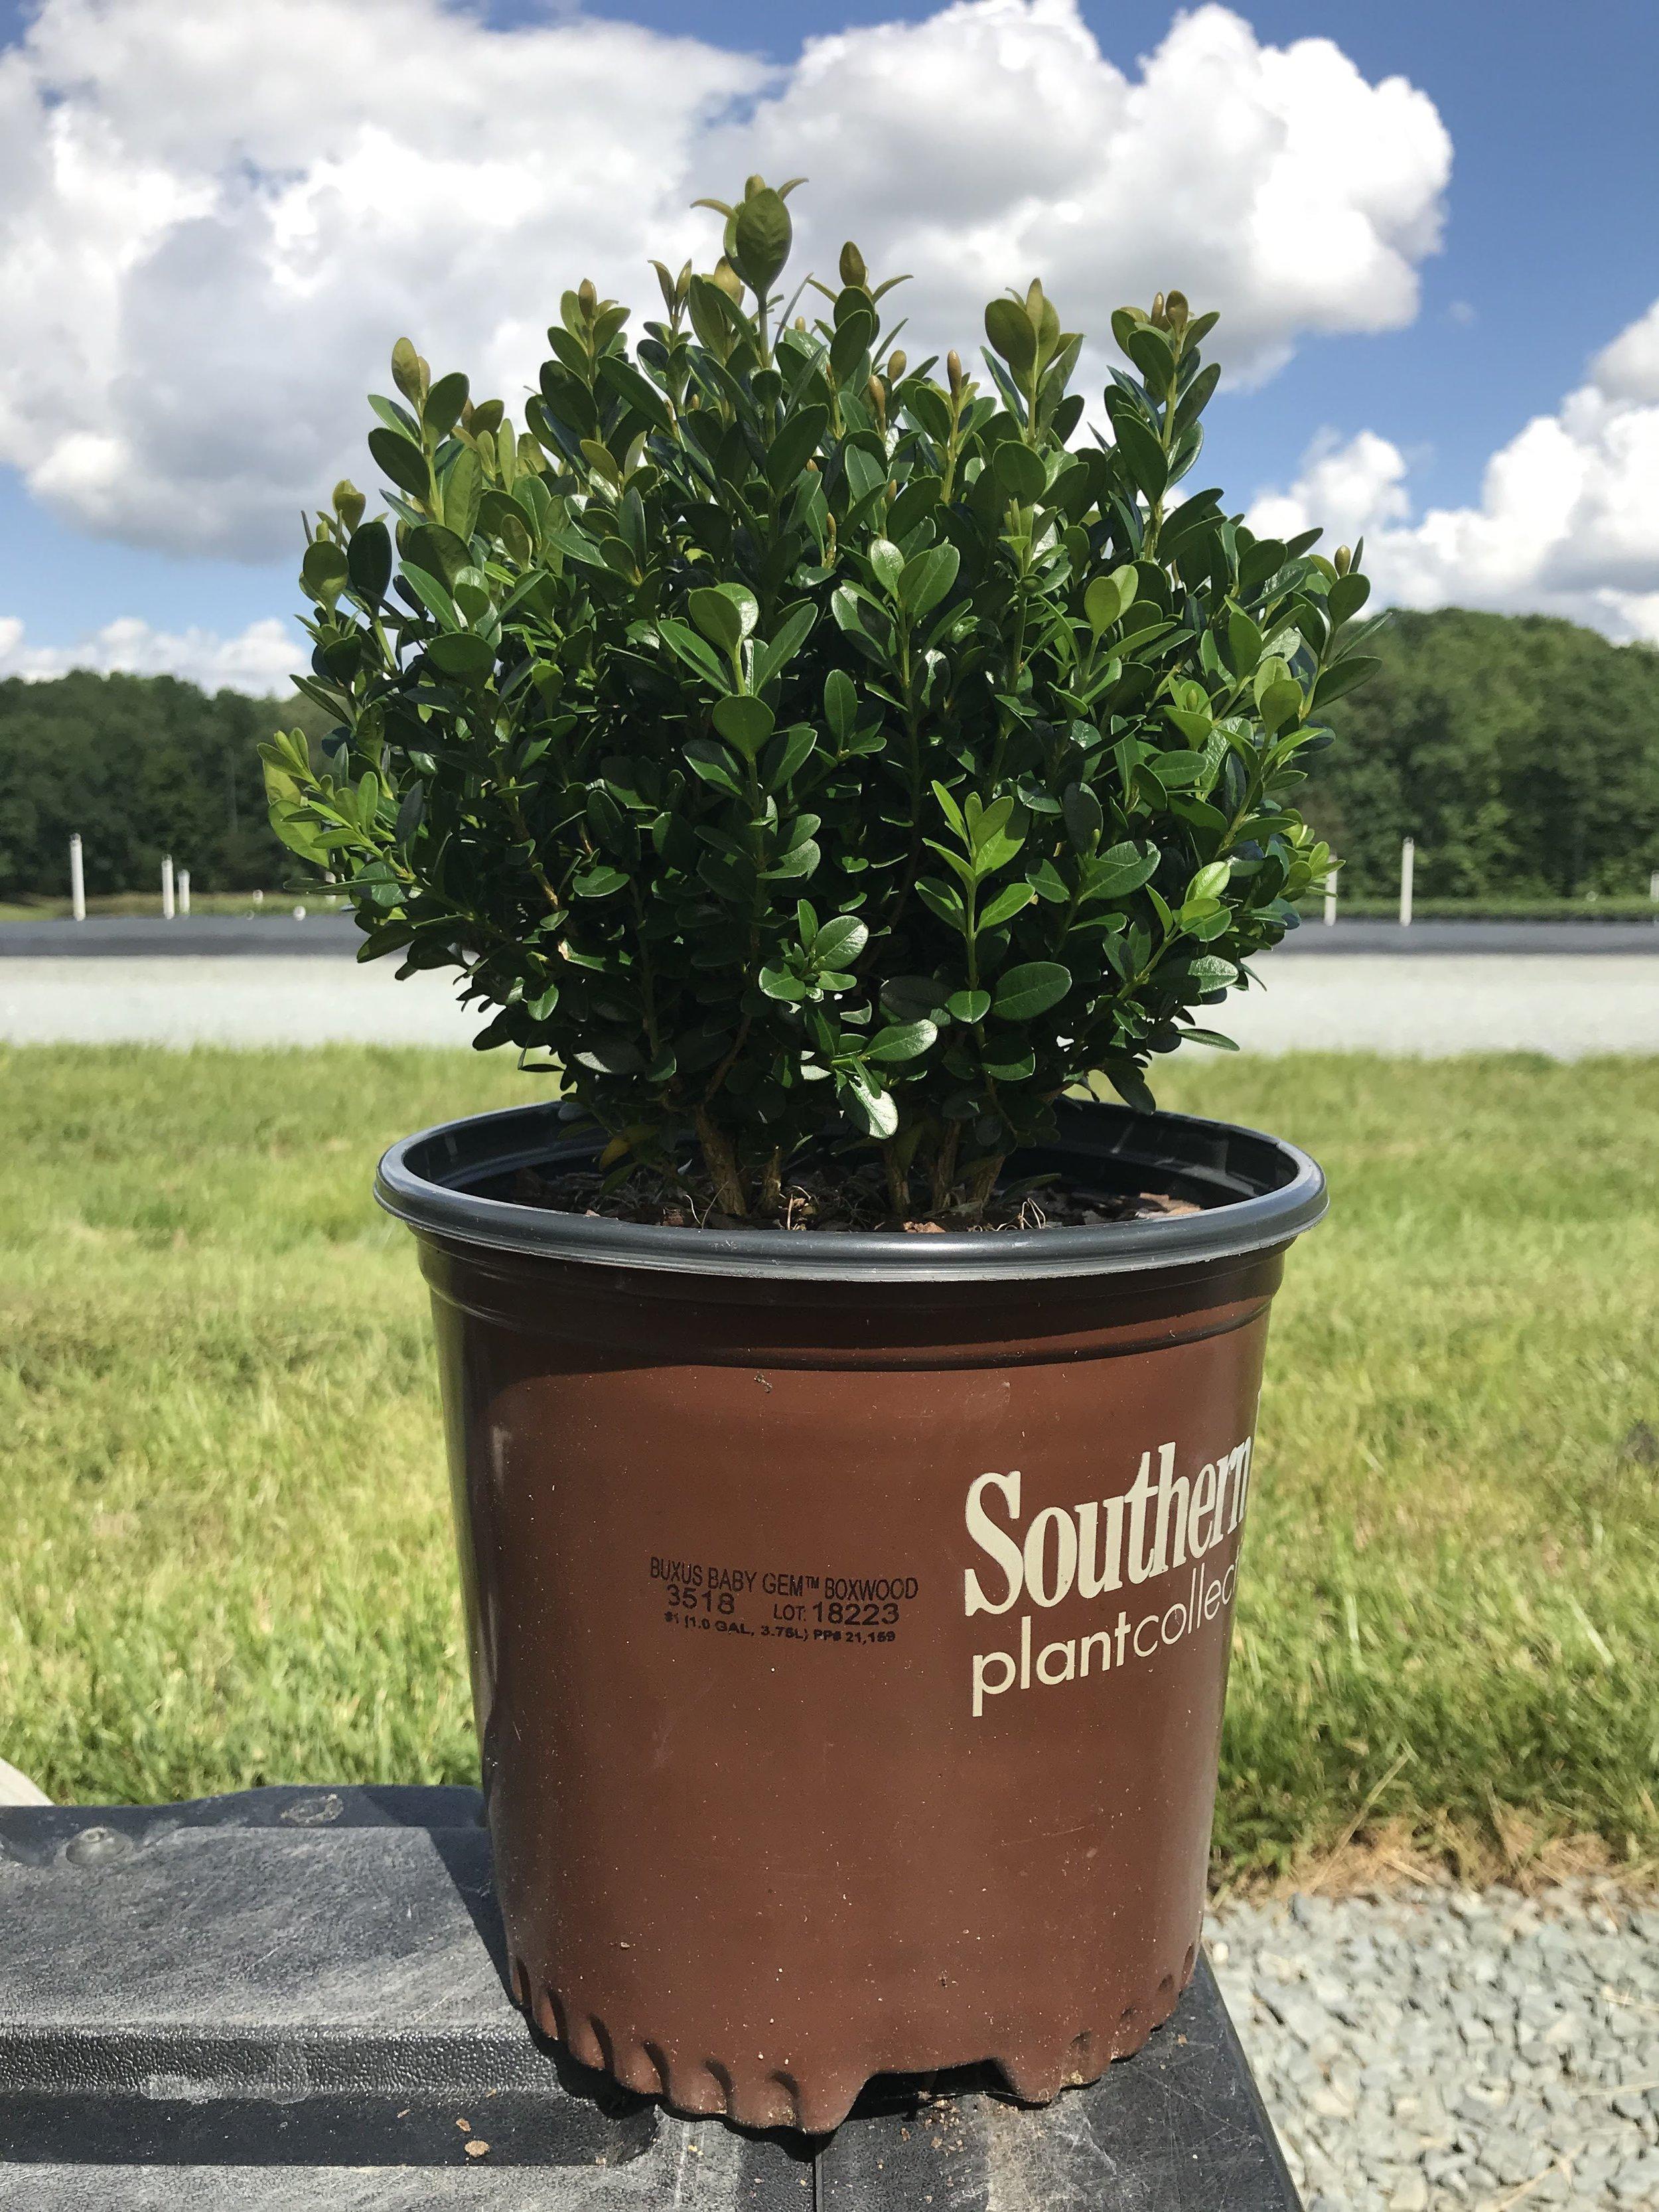 Buxus microphylla 'Baby Gem' 1 gallon